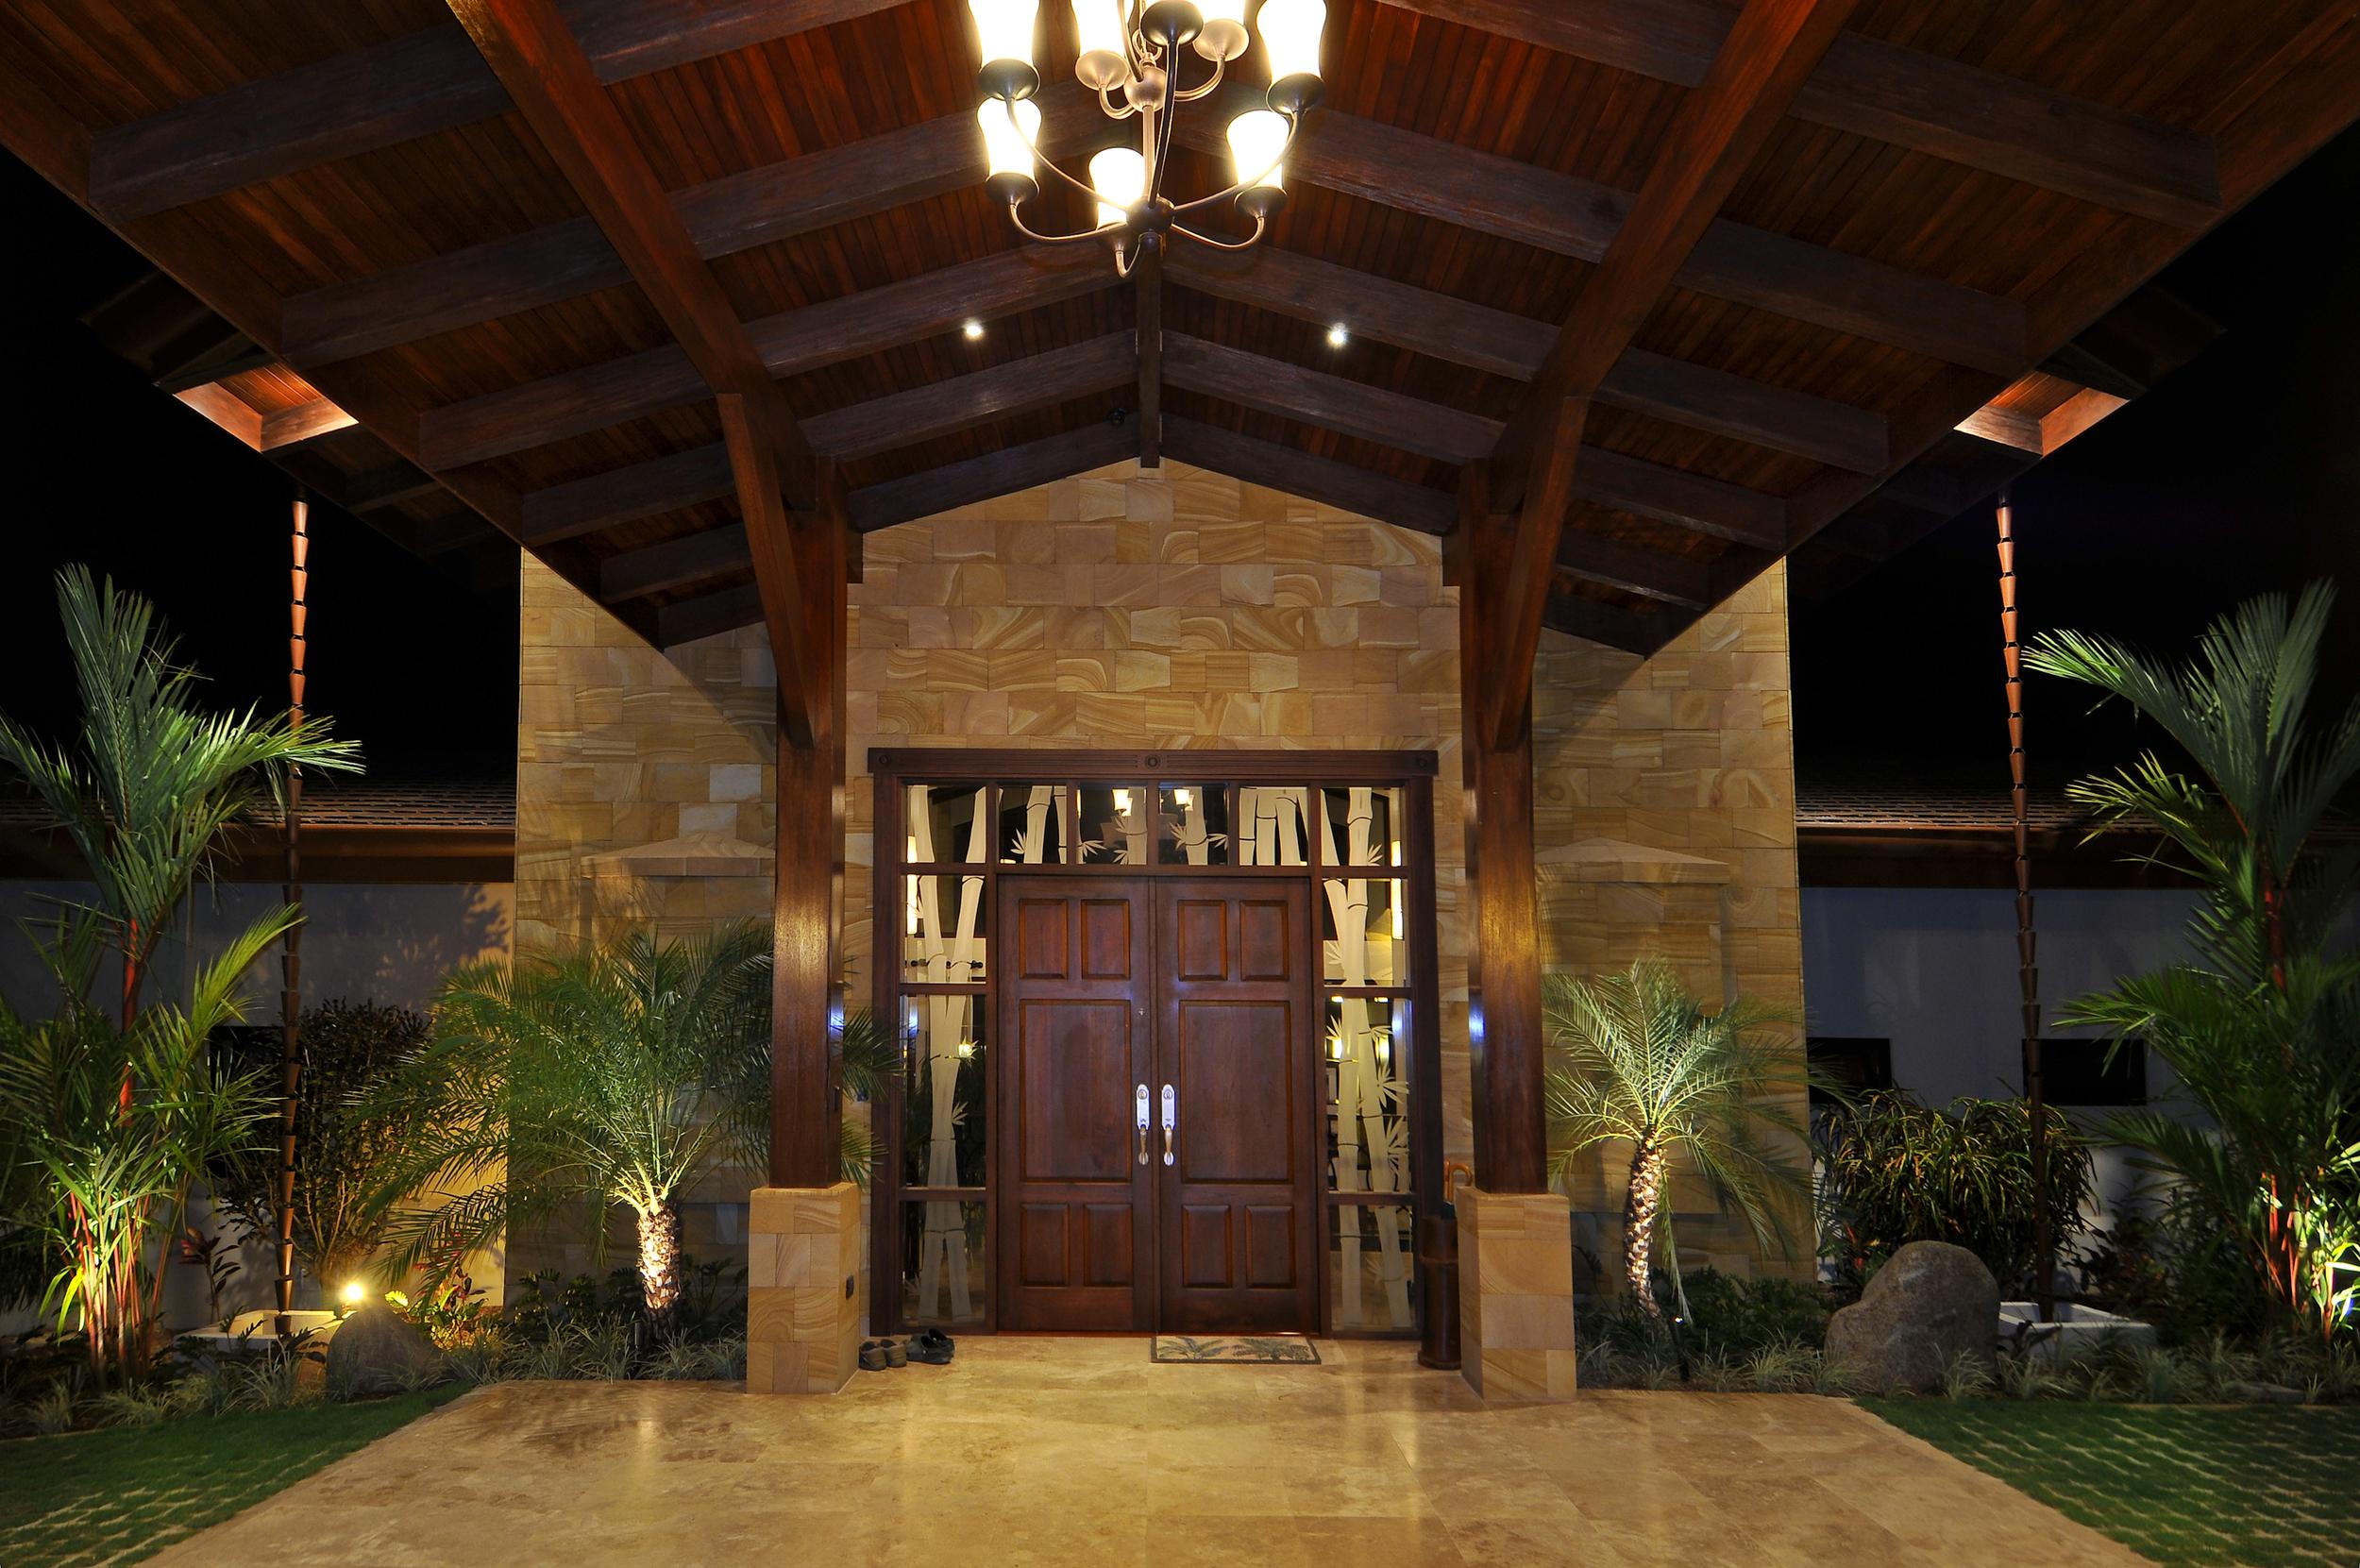 flex5-yoga-retreat-costa-rica-villa-front-door.jpg